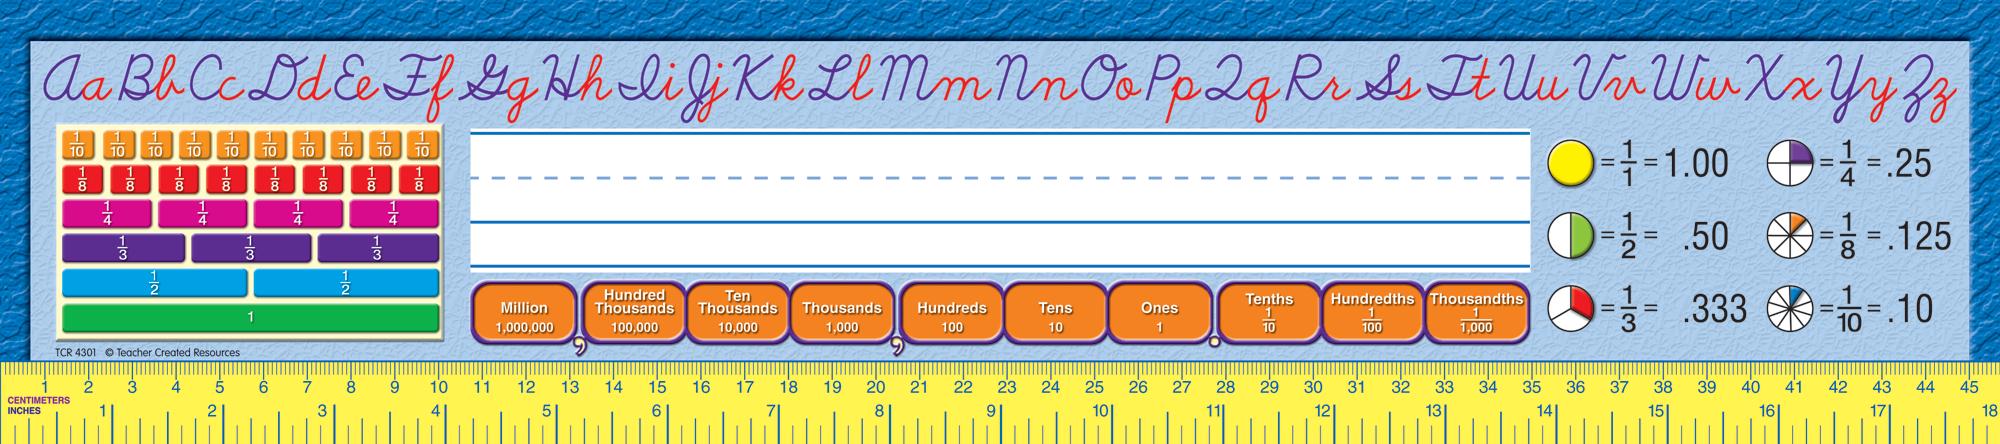 Cursive Writing 2 Super Jumbo Name Plates